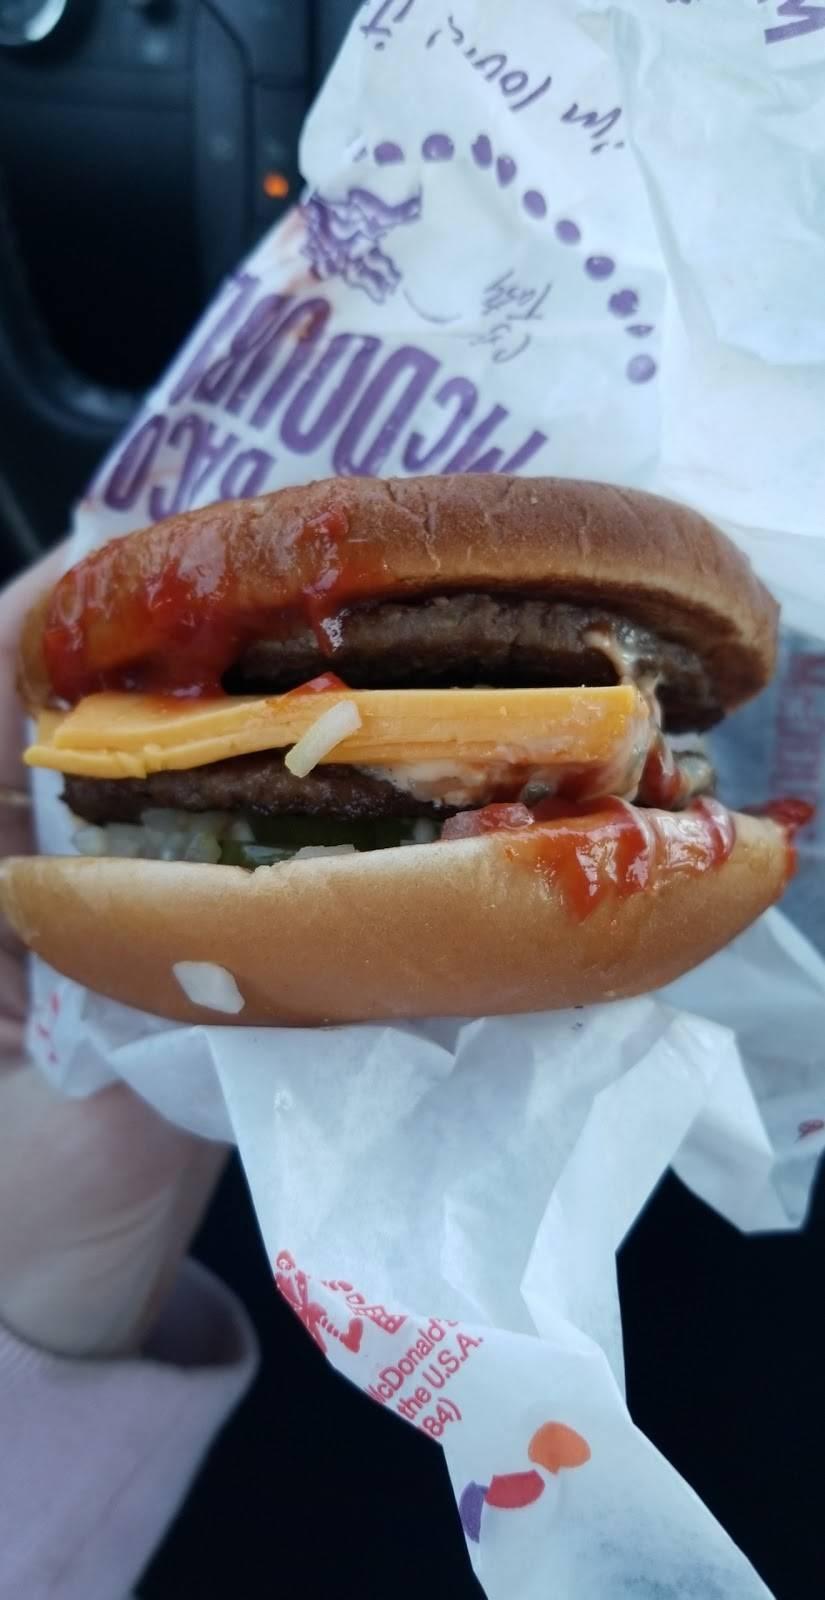 McDonalds | cafe | 914 Washington St, Middletown, CT 06457, USA | 8603440666 OR +1 860-344-0666